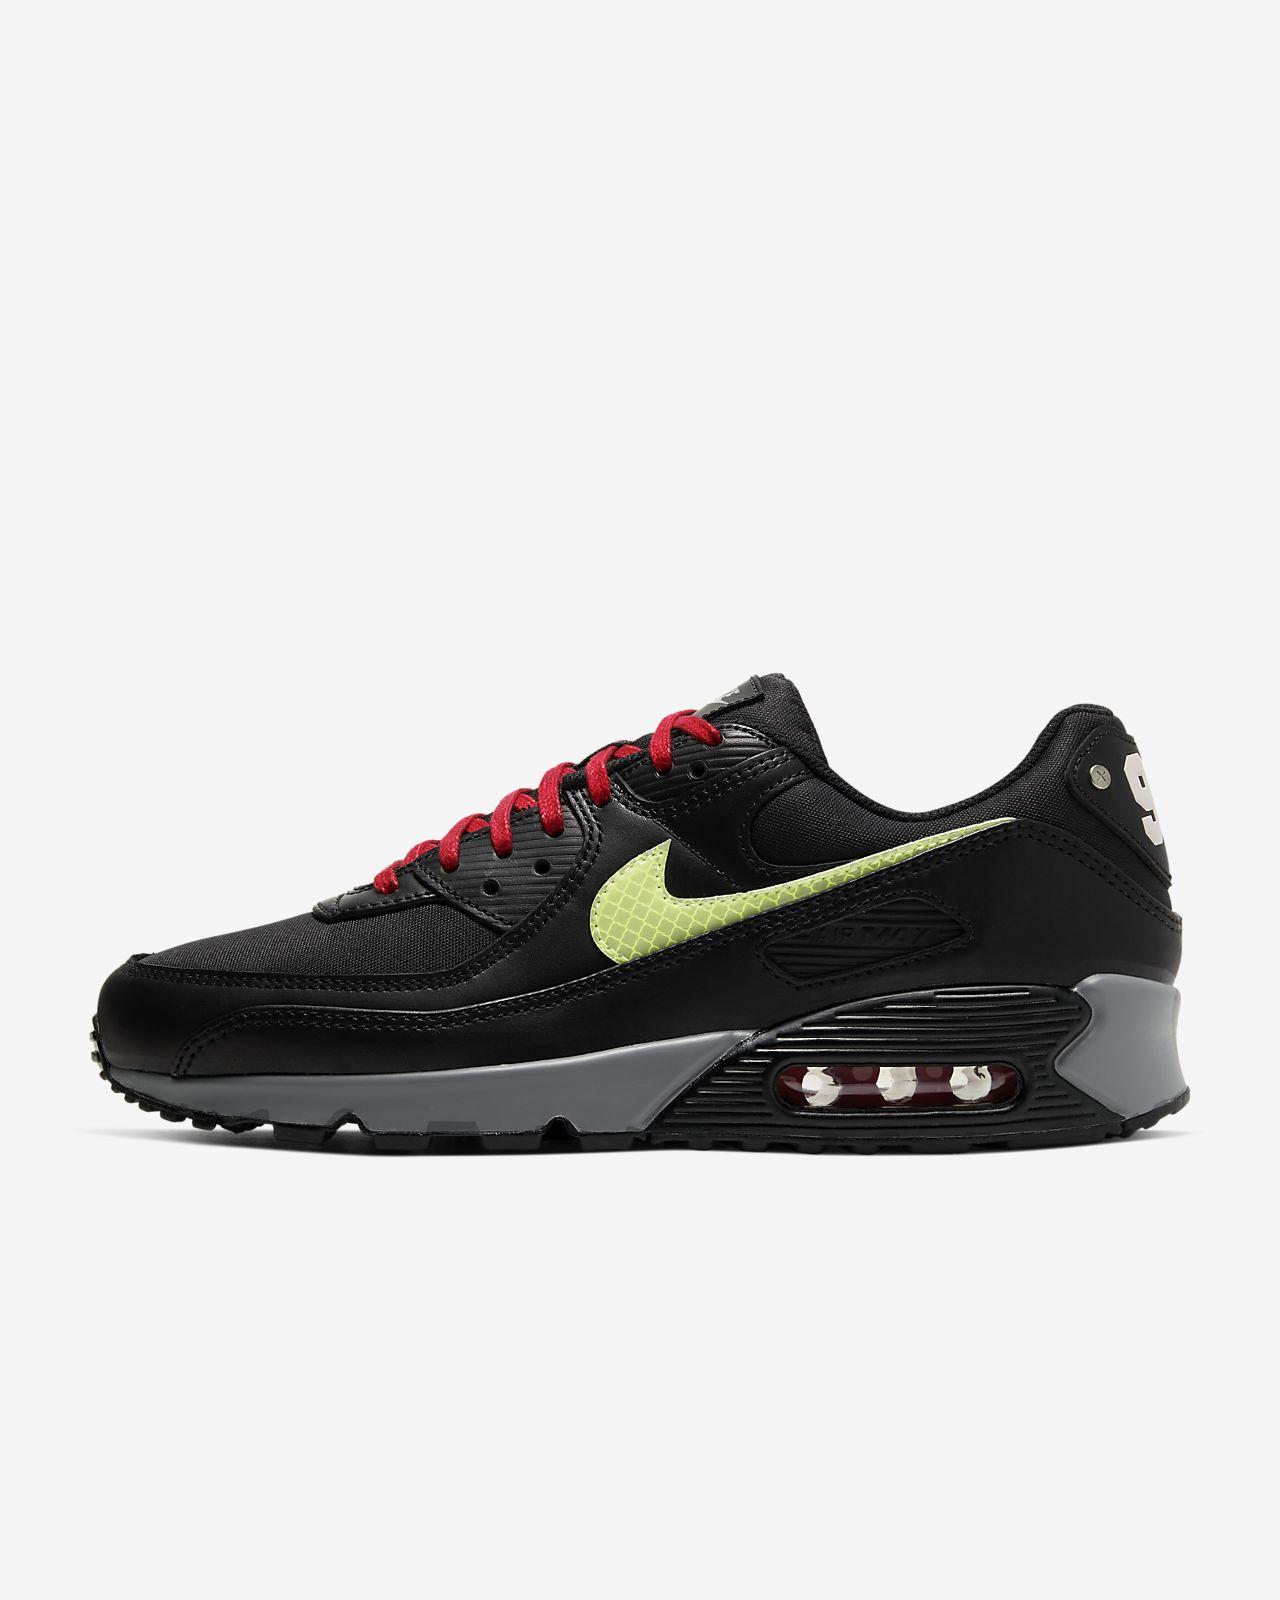 Calzado para hombre Nike Air Max 90 Premium